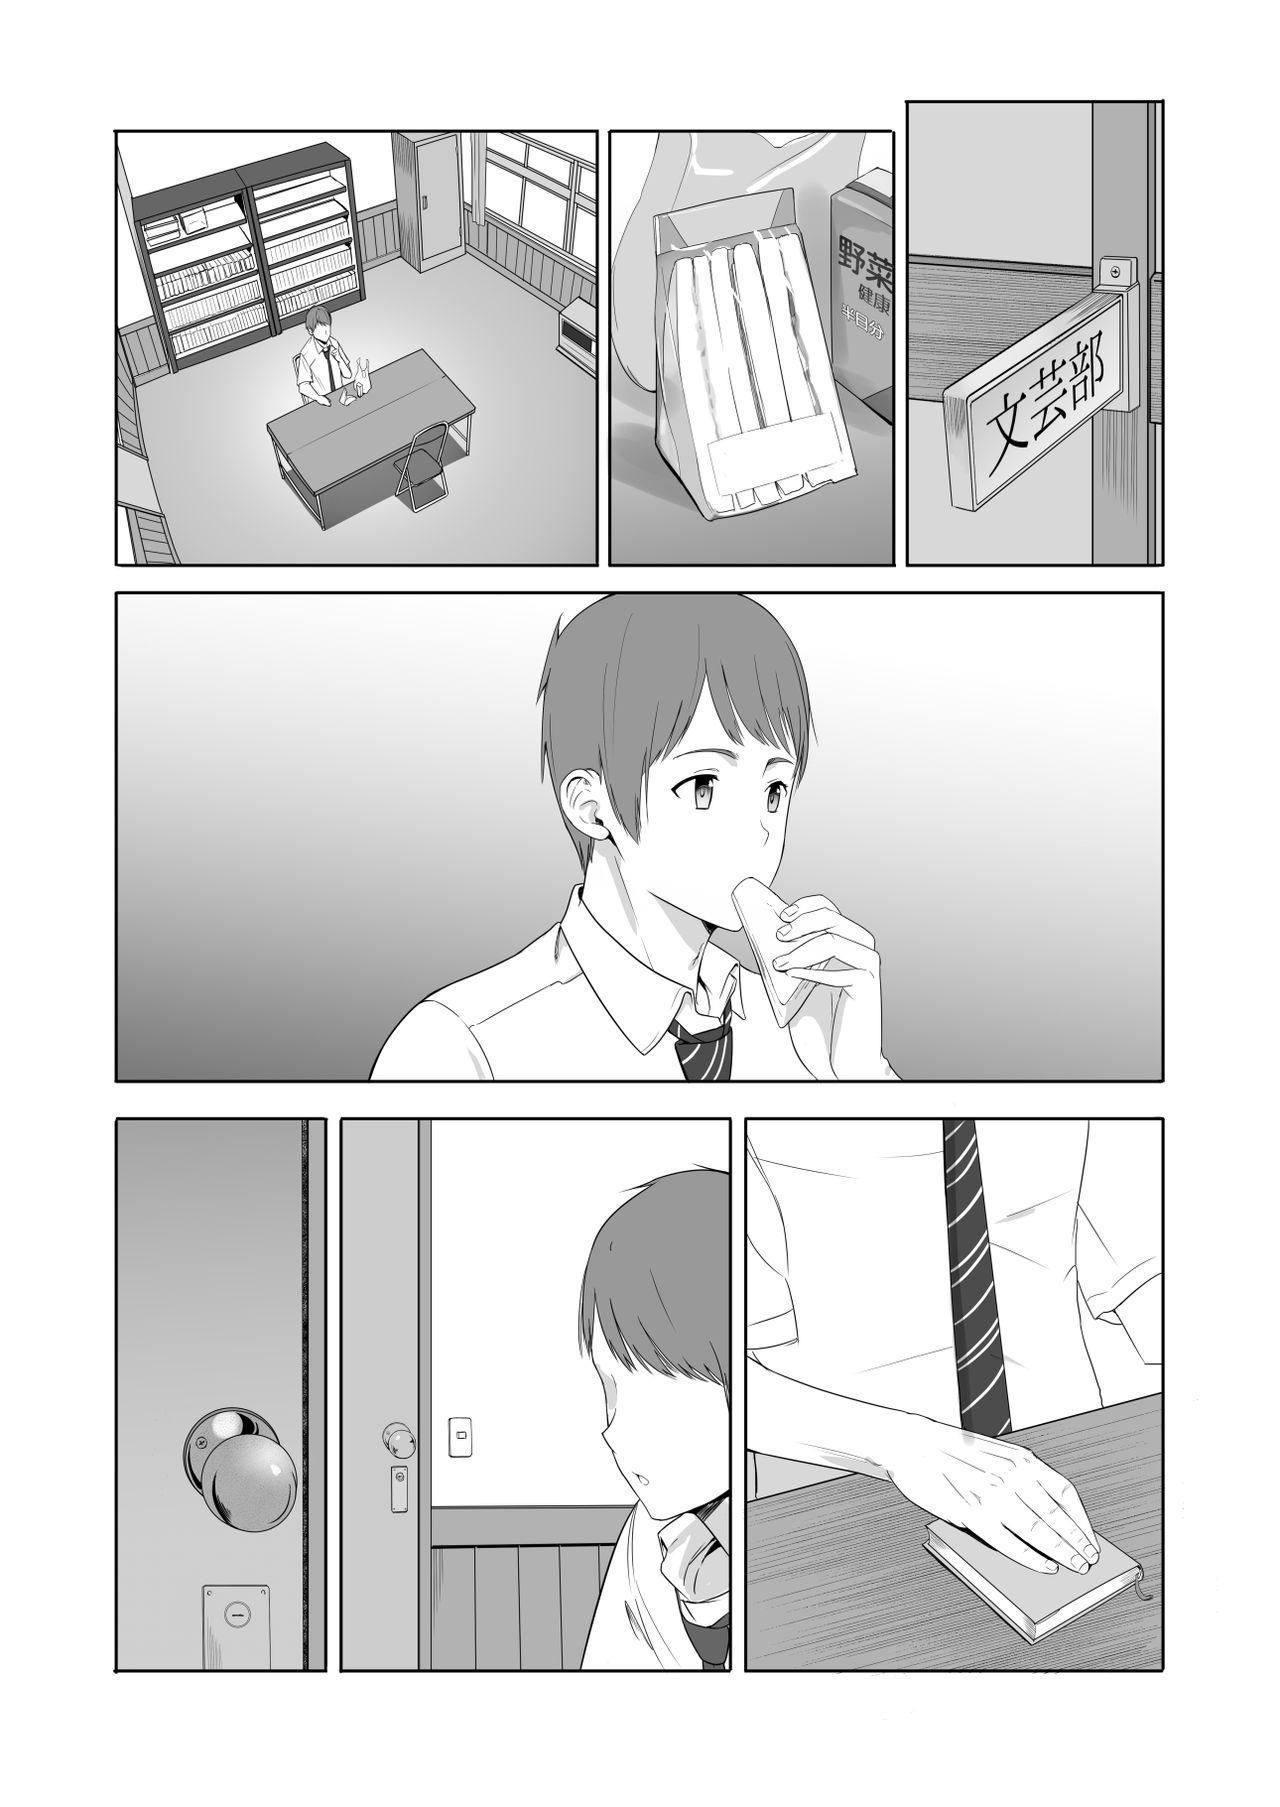 Kimi ga Tame. 2 Ichikawa Inori 99